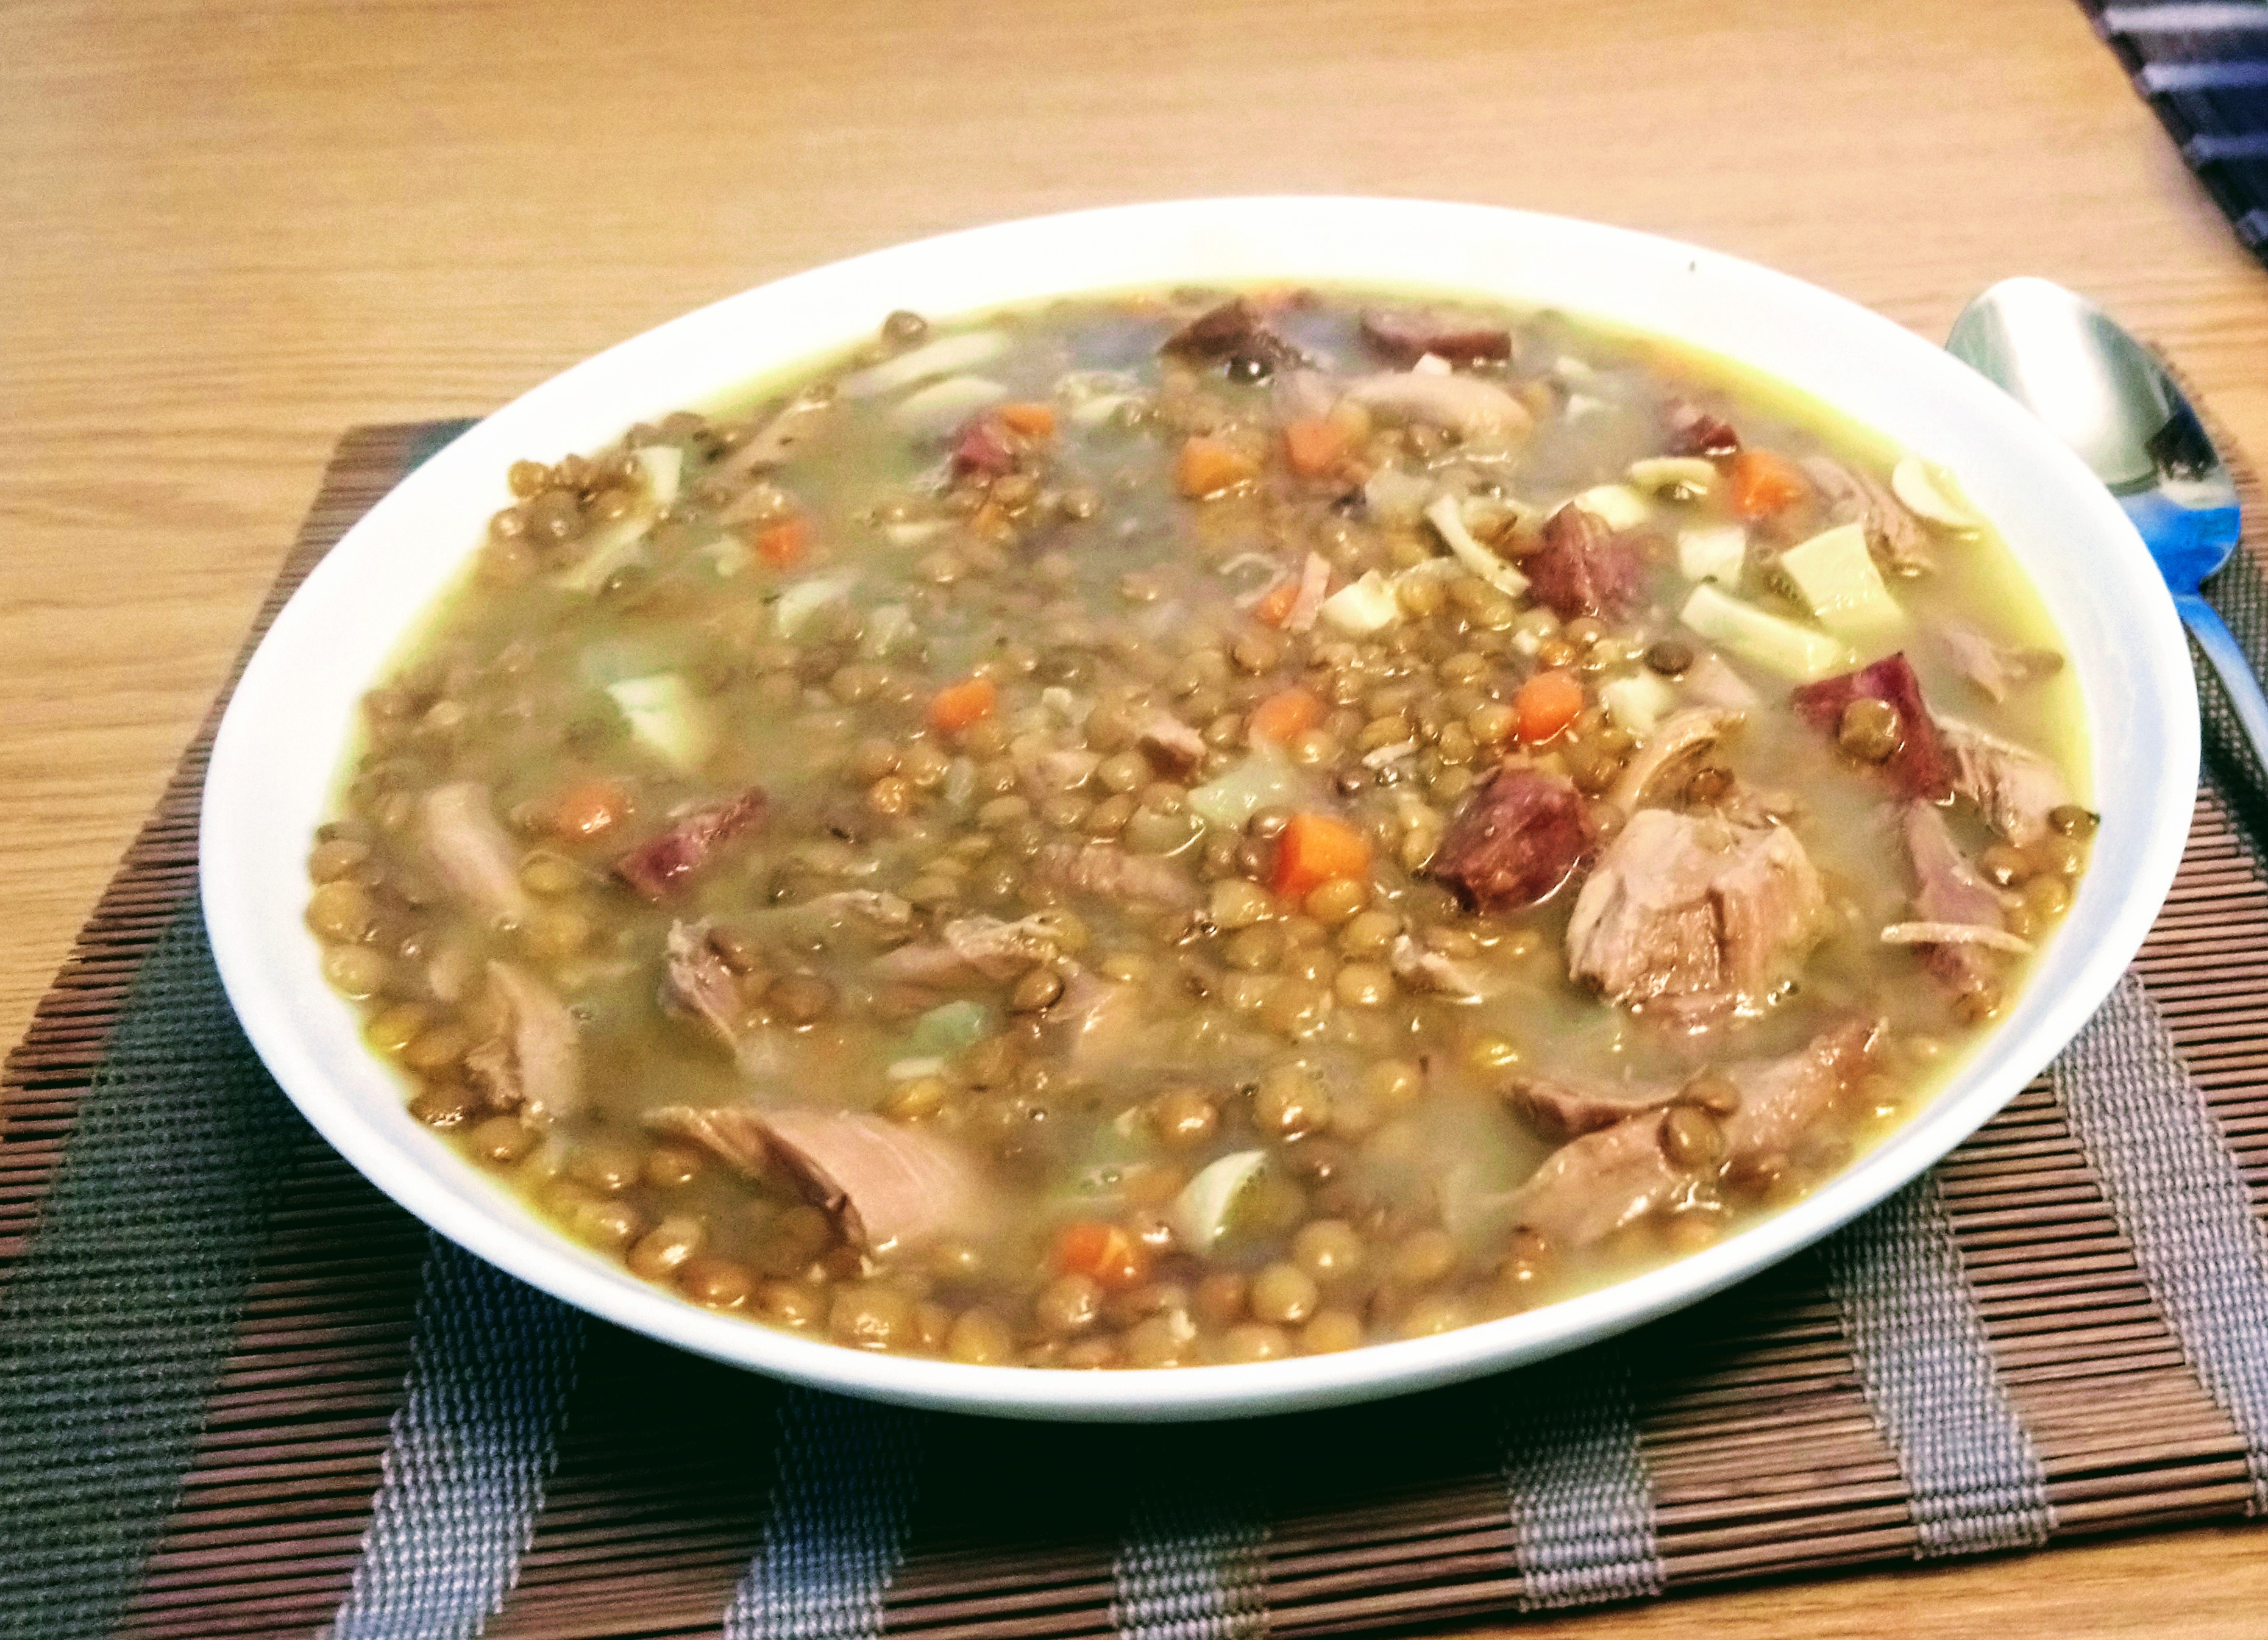 Andouille, Mushroom, and Lentil Soup